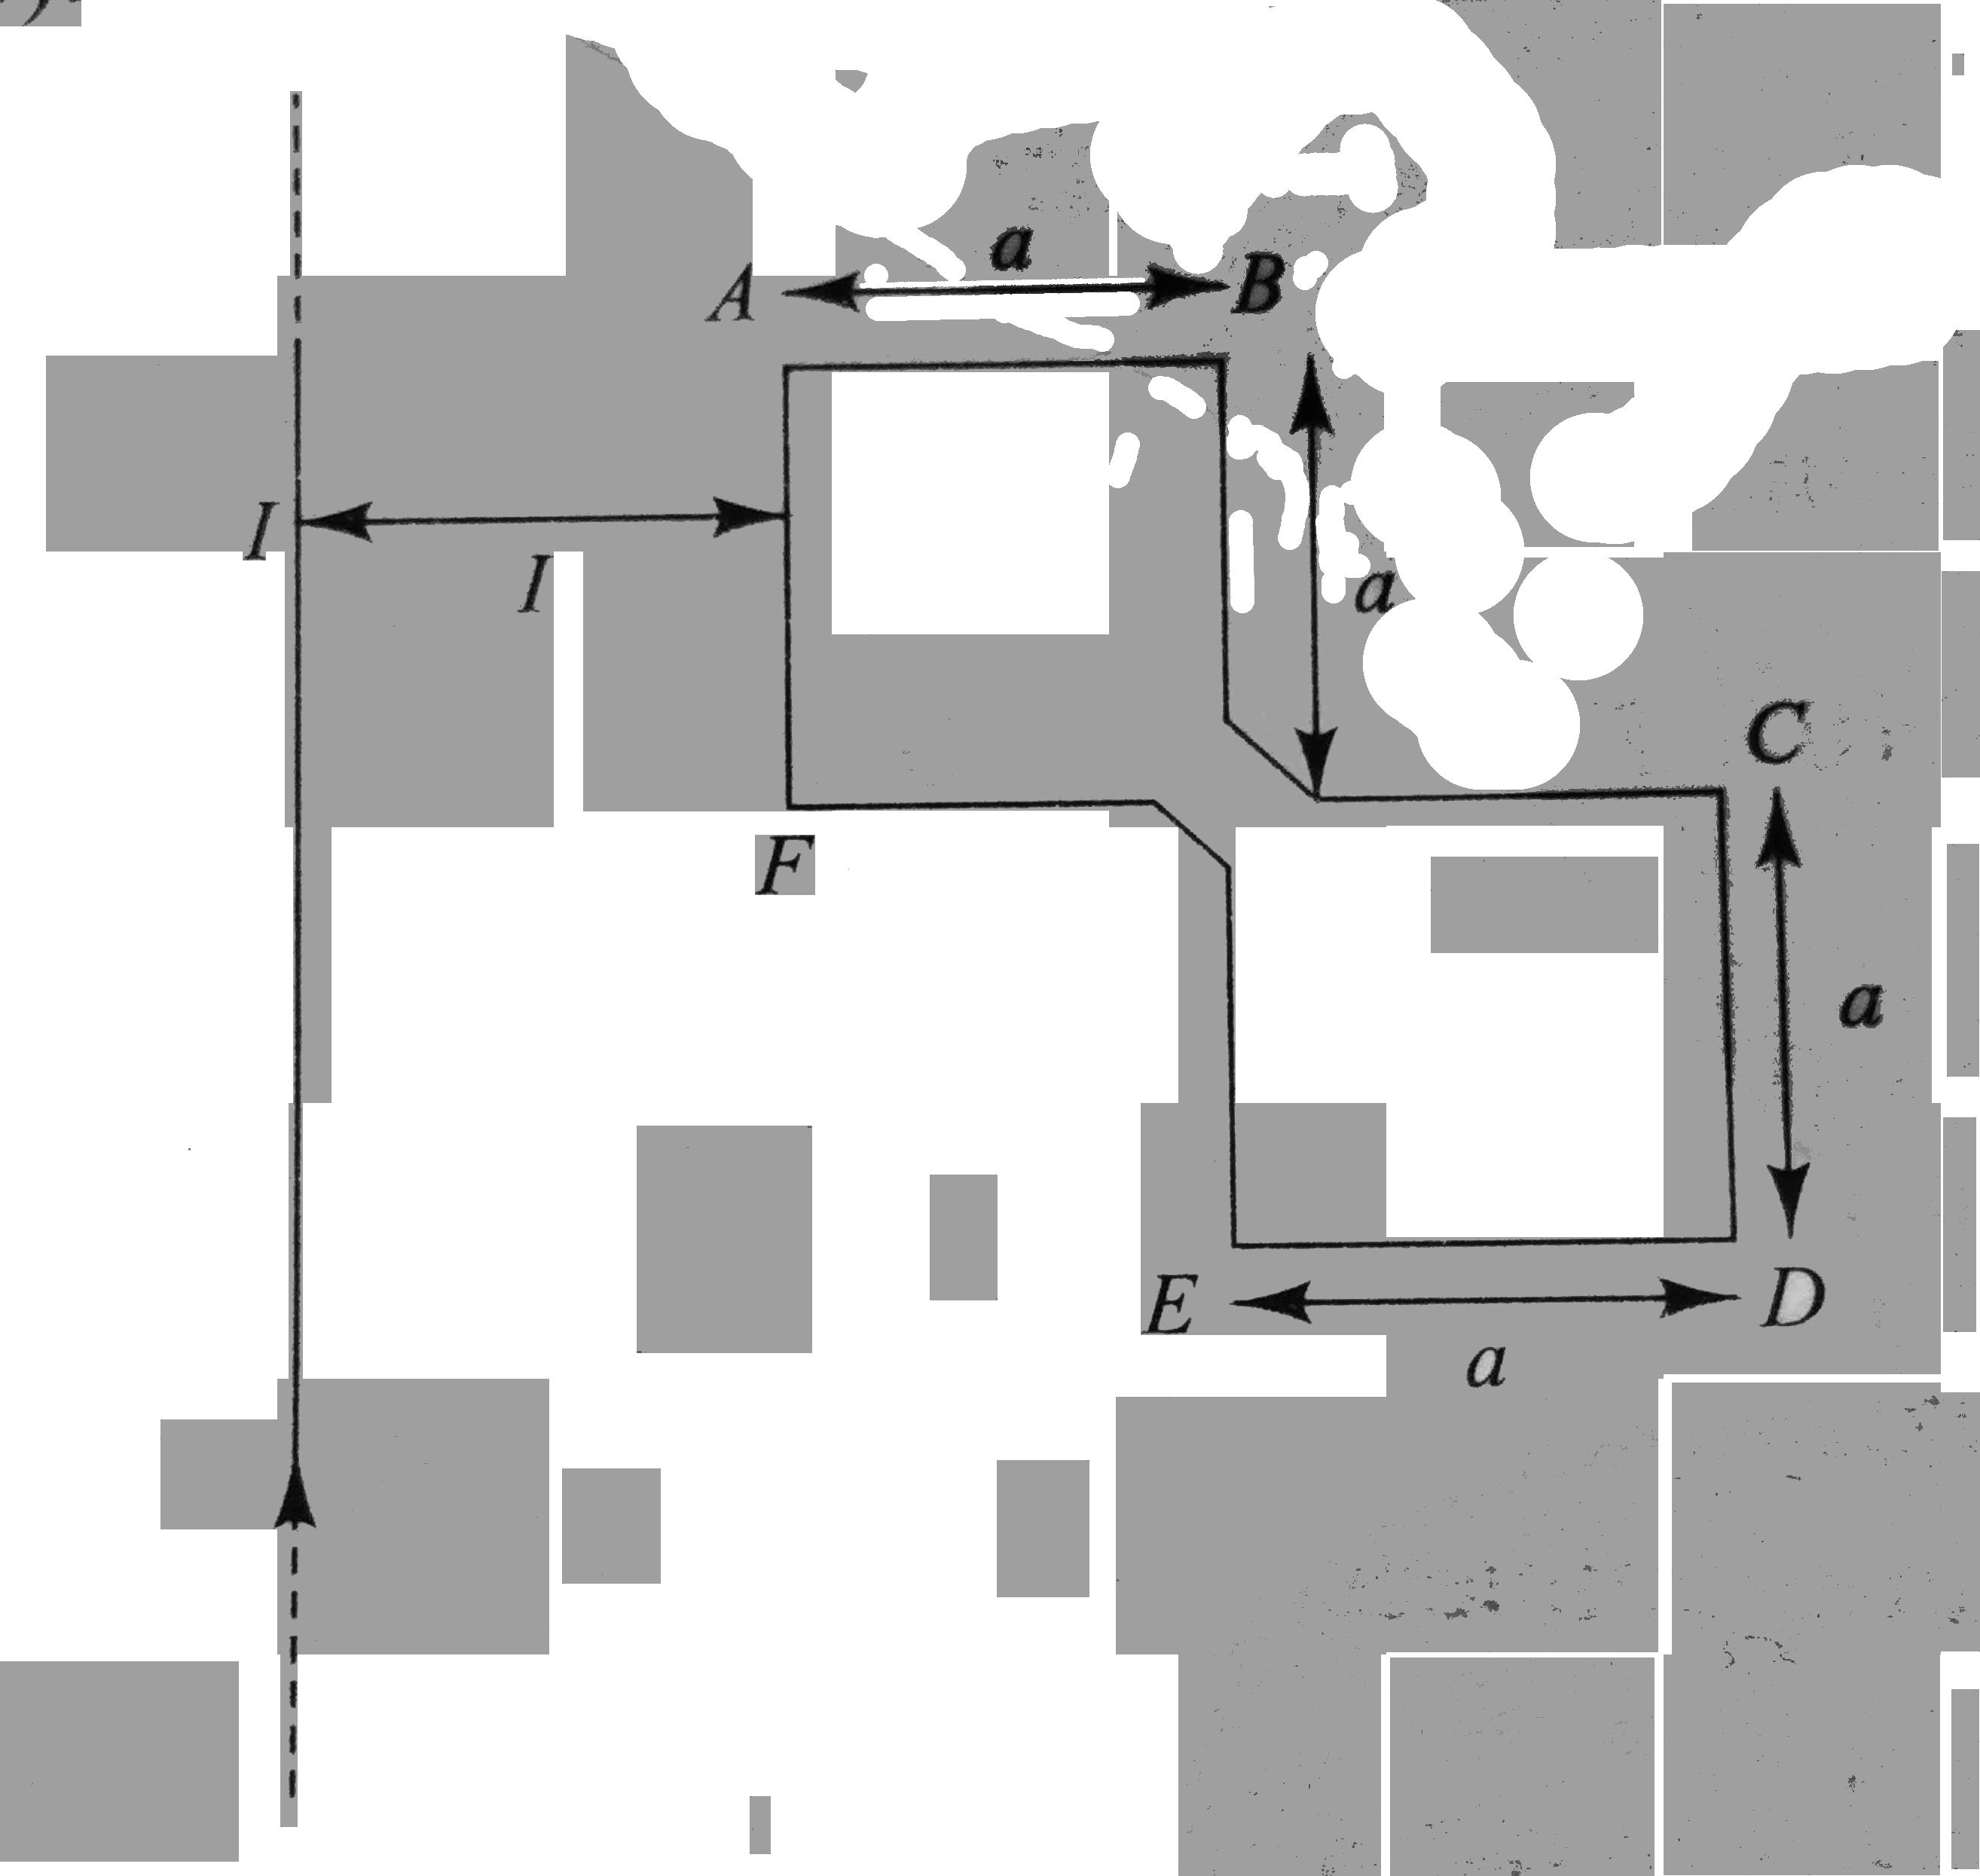 T Loop Wiring Diagram - Diagrams Catalogue Ab C D Circuit Diagram on